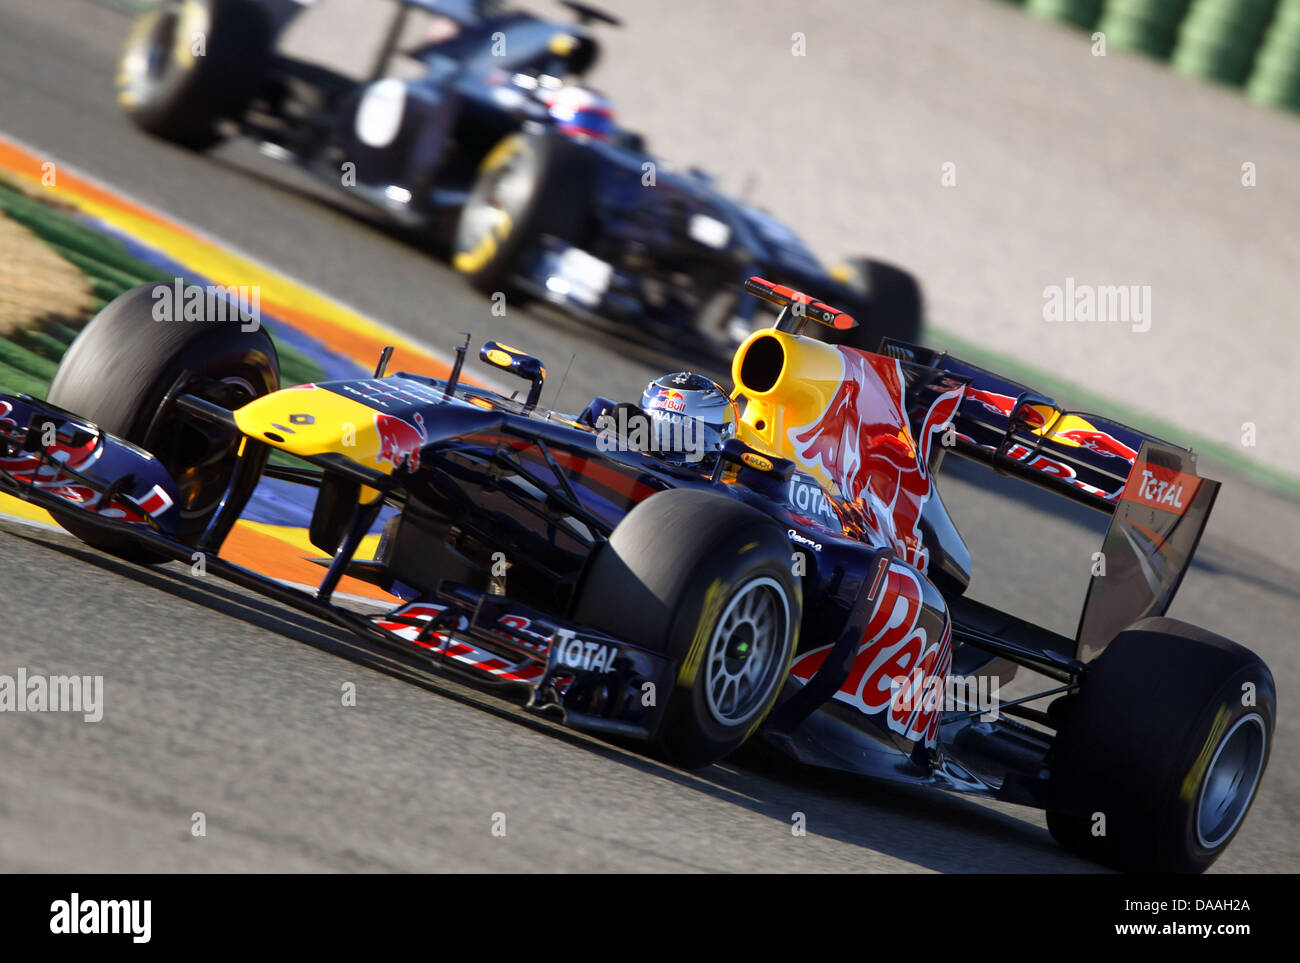 List of Formula One drivers